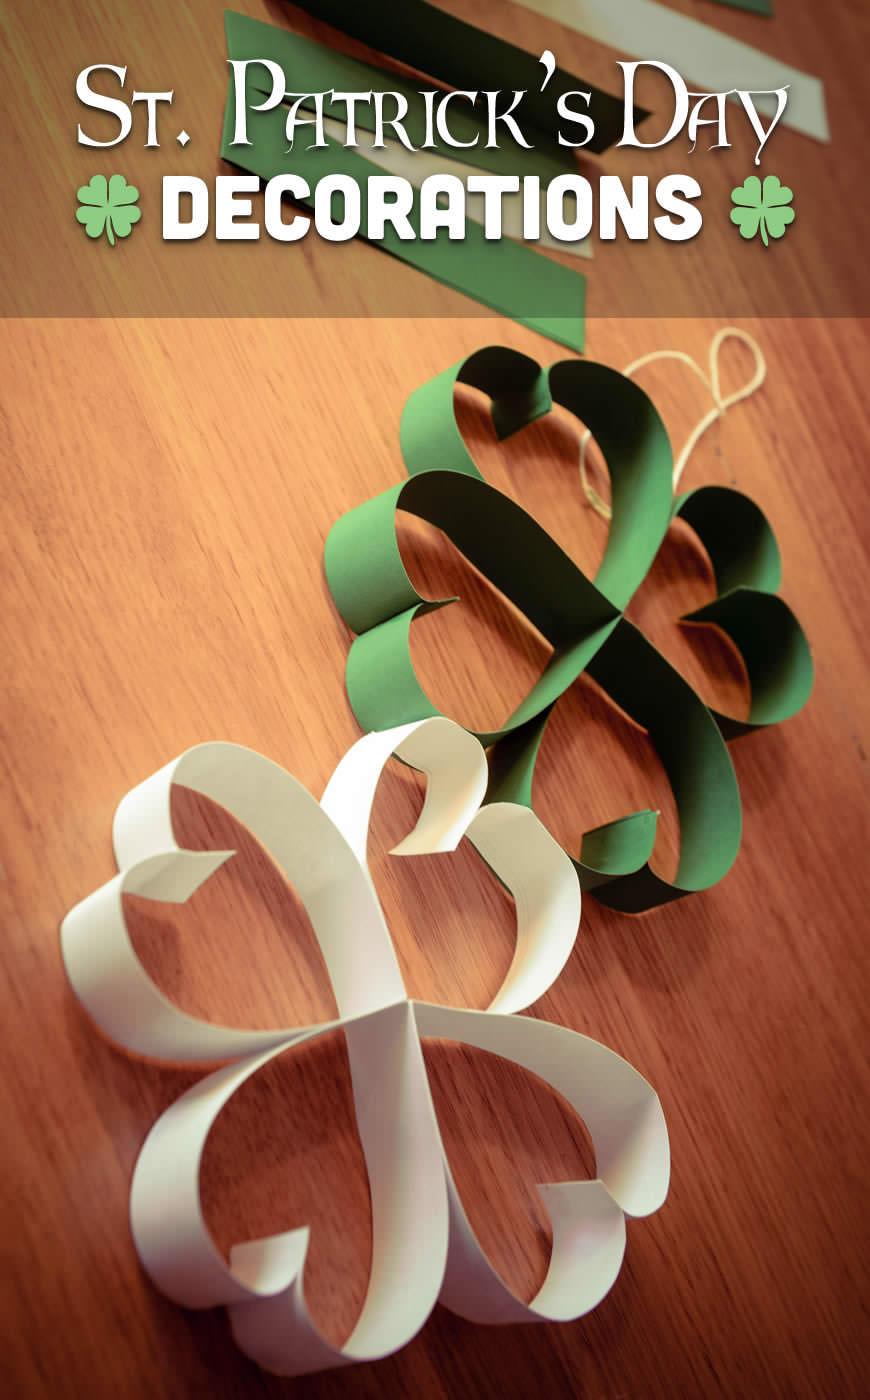 Make your own beautiful hanging shamrock decorations!